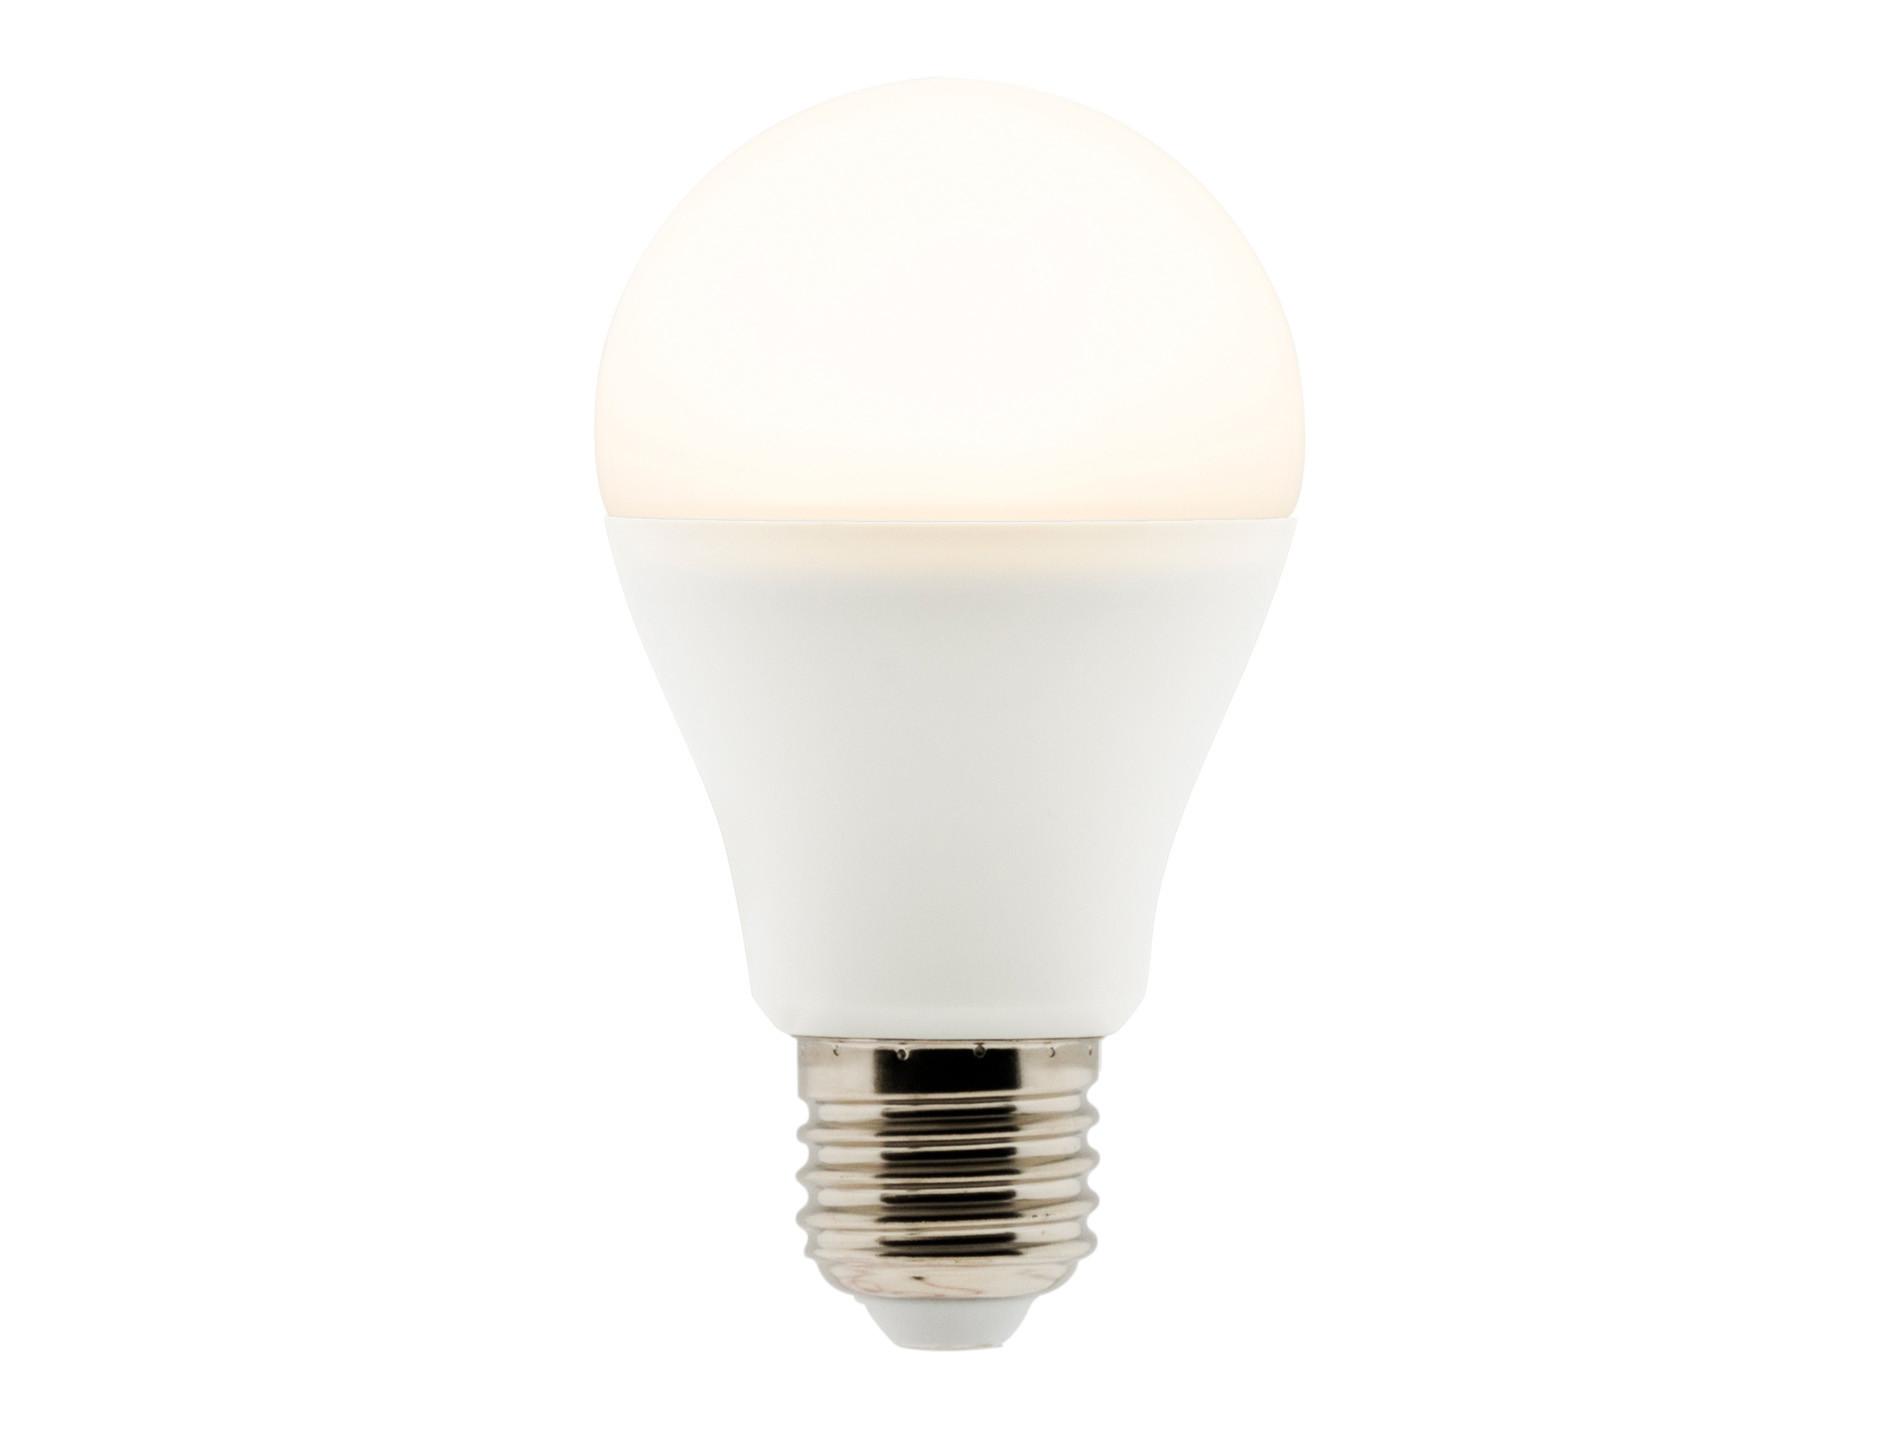 Led Standard E27 Dimmable Ampoule 10w kwXON08nP